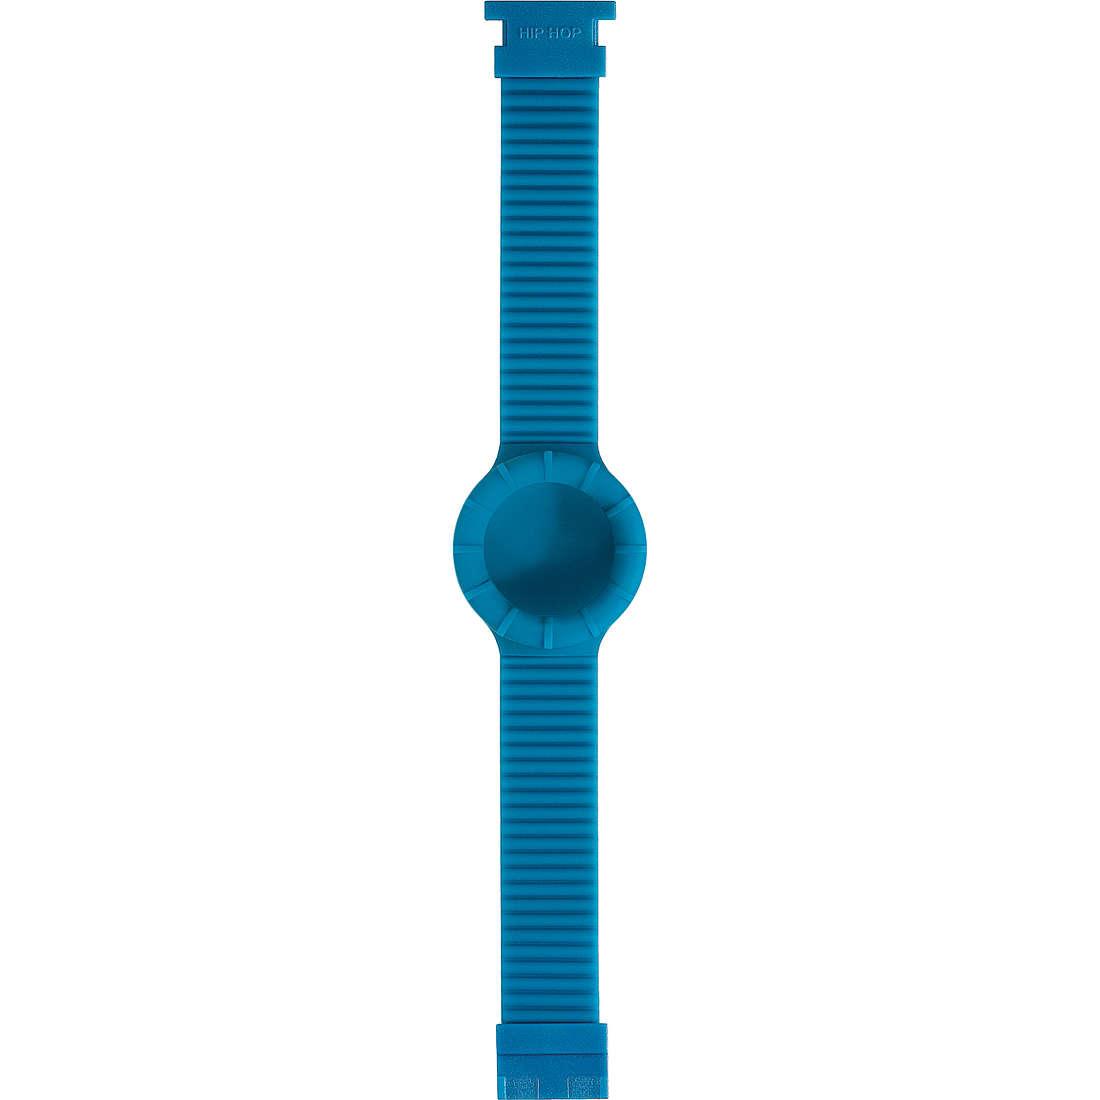 orologio accessorio unisex Hip Hop HBU0027